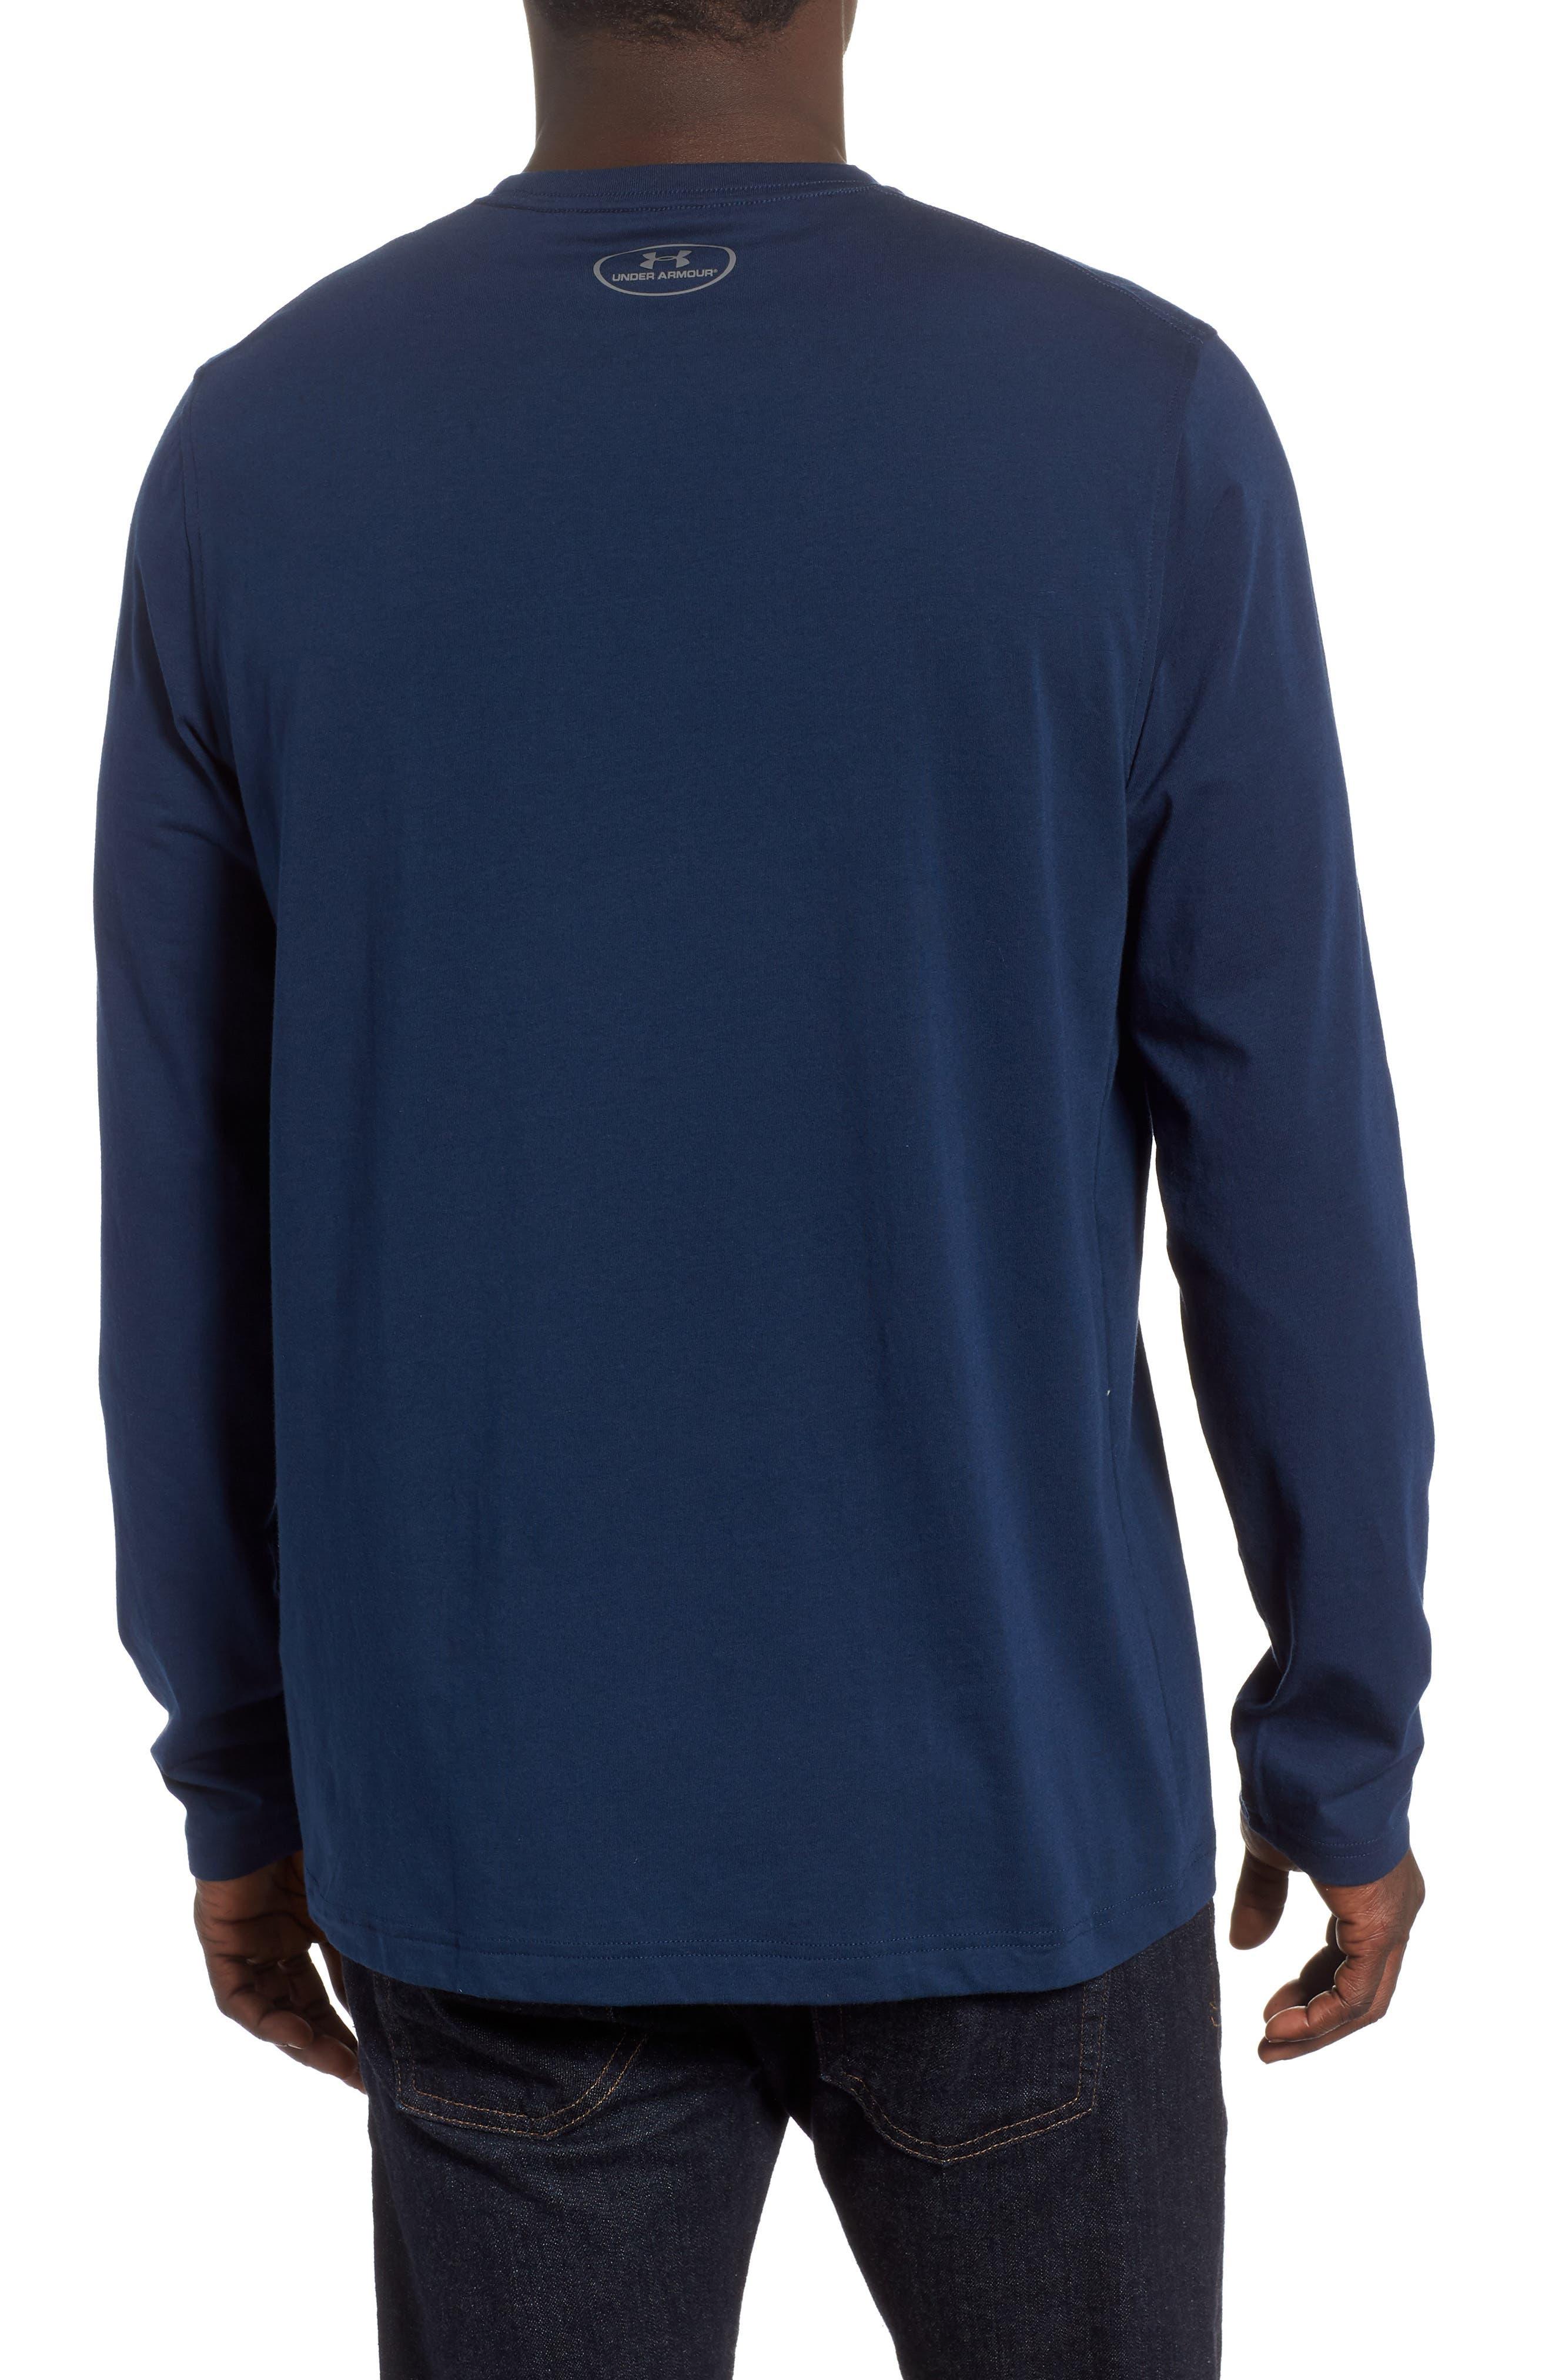 HeatGear<sup>®</sup> Long Sleeve Performance T-Shirt,                             Alternate thumbnail 2, color,                             ACADEMY/ ROYAL